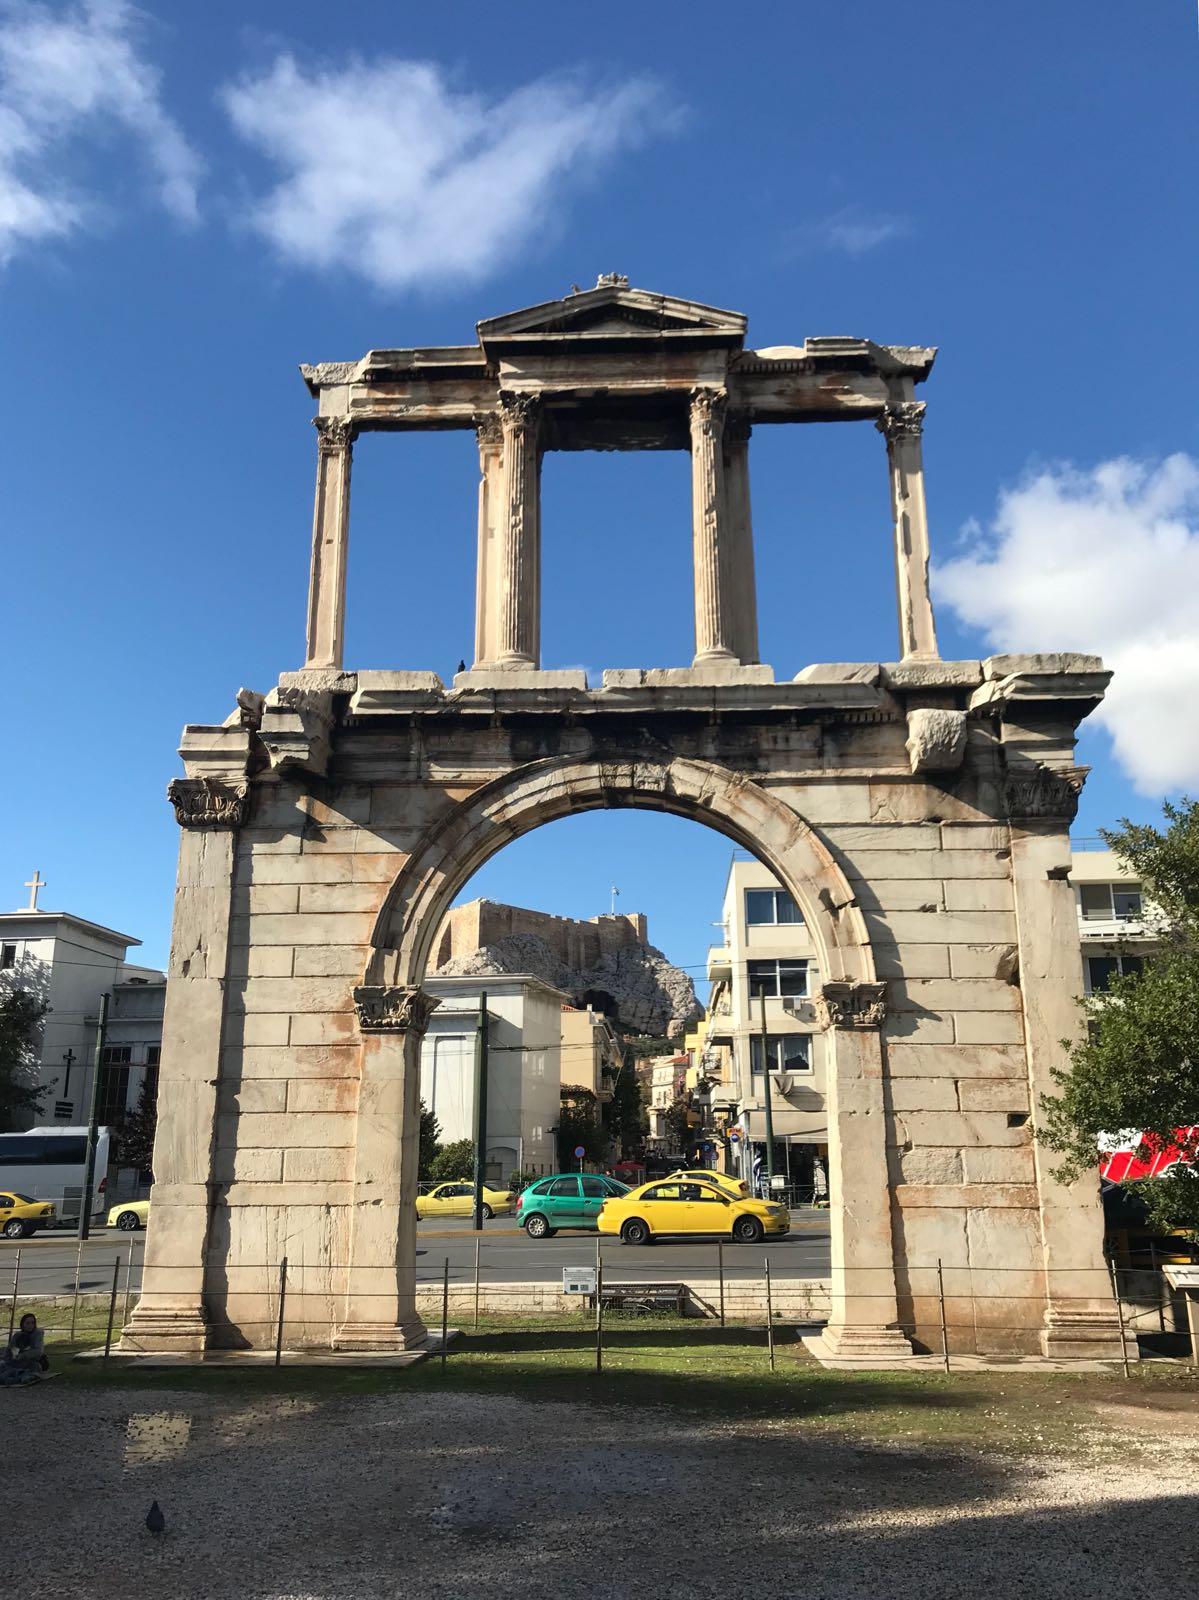 Hadrian's arch near the temple of Olympian Zeus